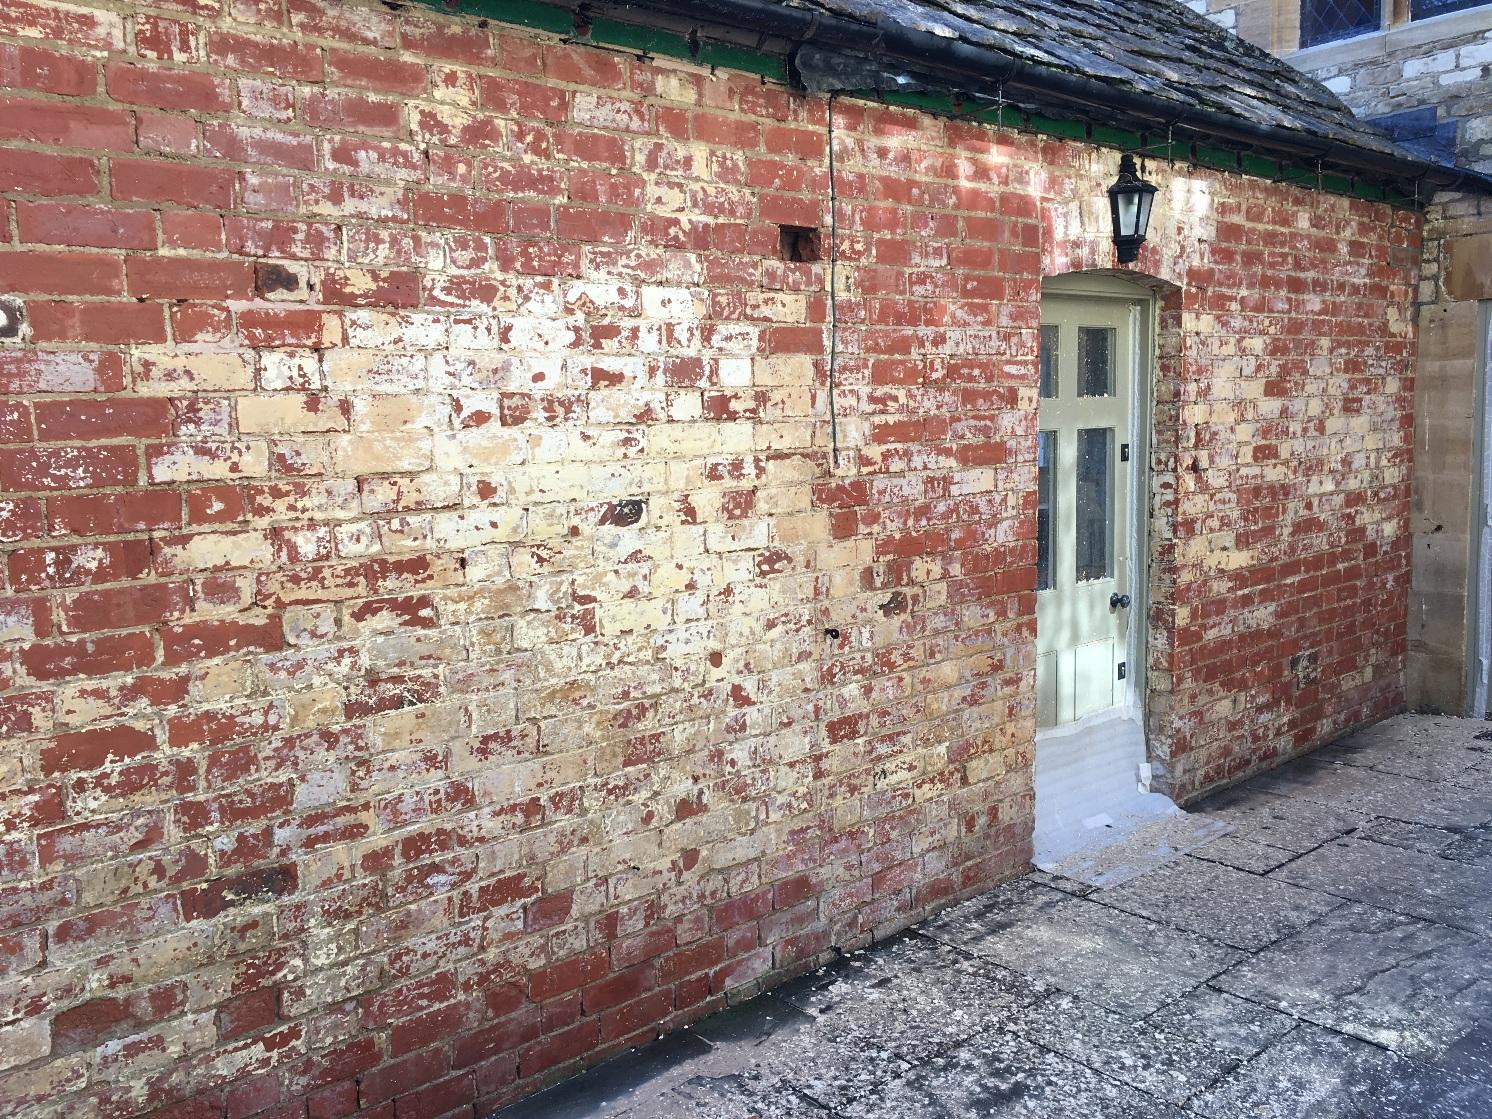 Removing limewash from brickwork